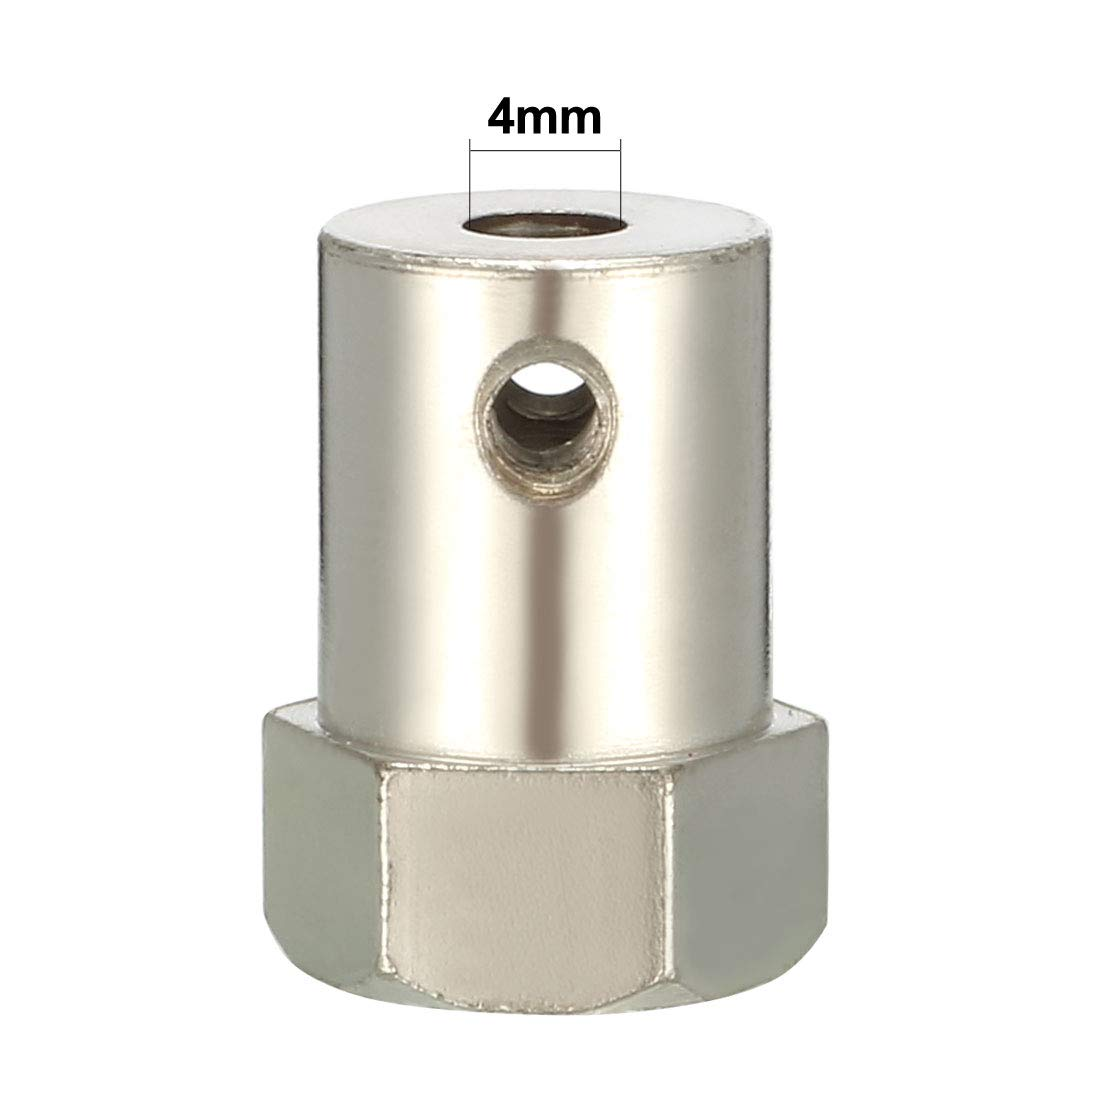 sourcing map Shaft Coupling 3.5mm Bore 18mm Long Hexagon Coupler Connector for Robot Motor Wheel w Screws